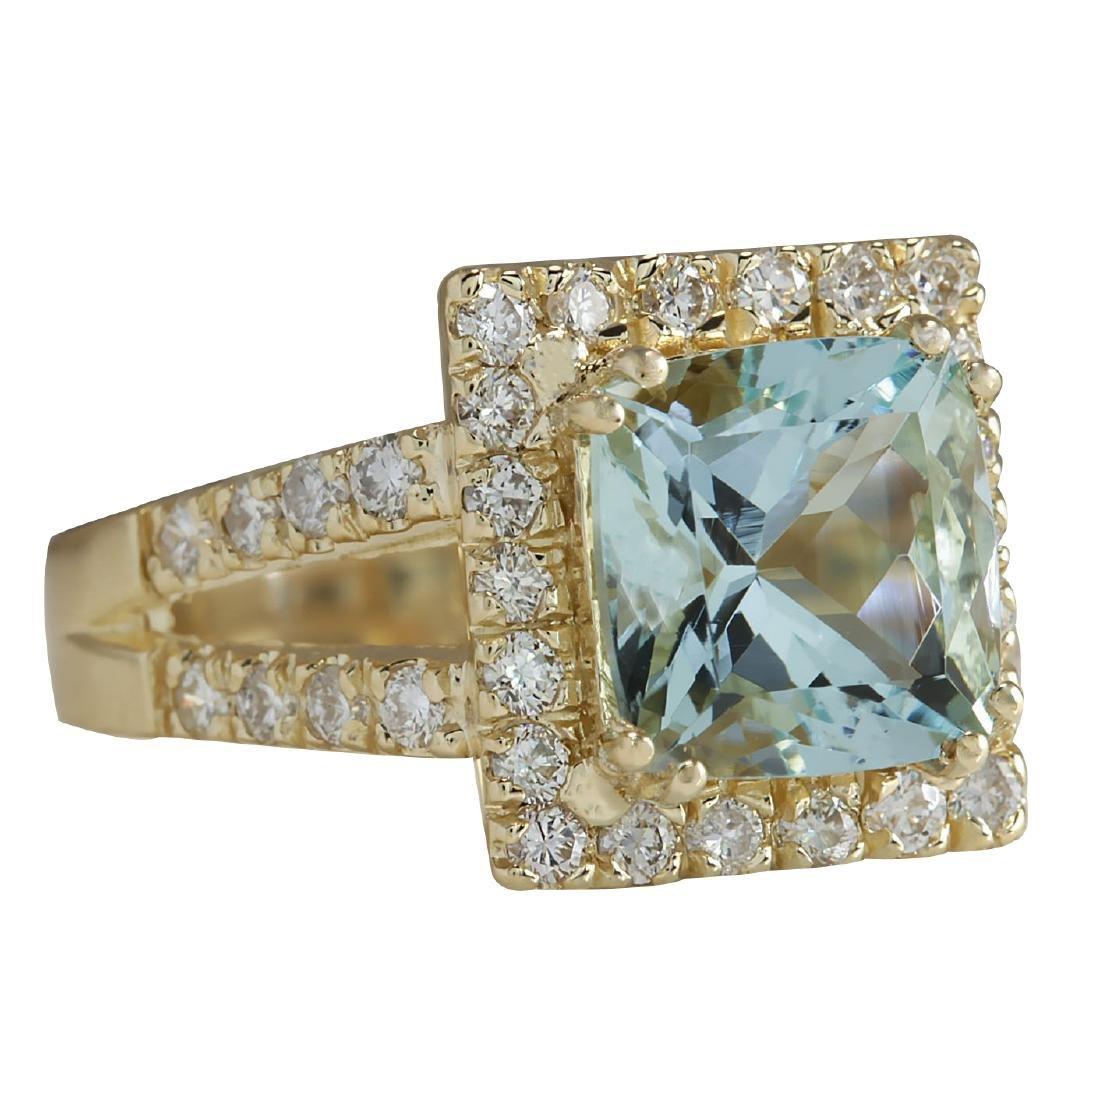 4.13CTW Natural Aquamarine And Diamond Ring In 18K - 2